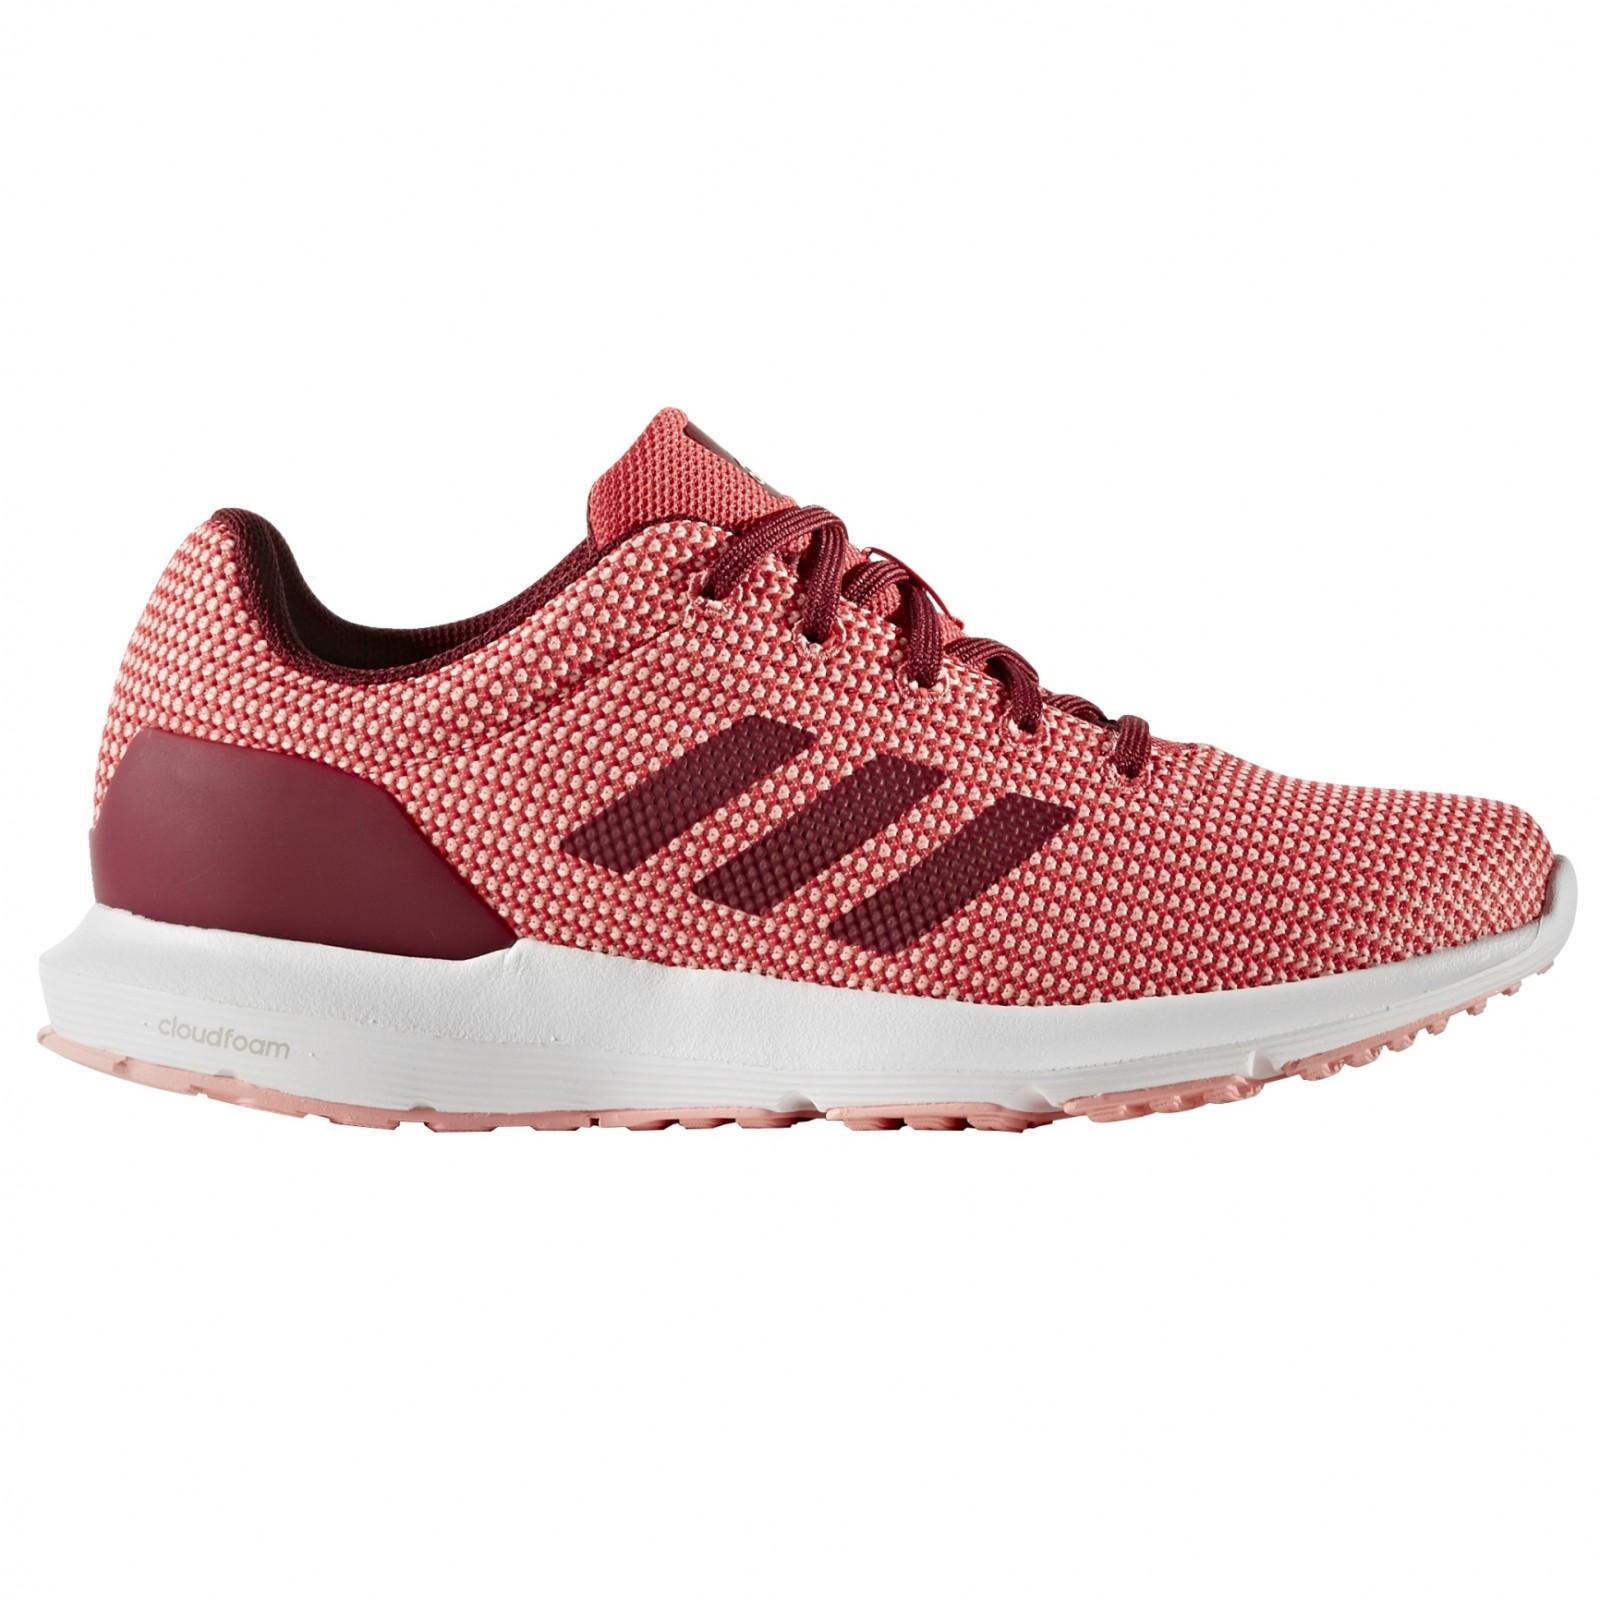 f2e28a54499 Dámské běžecké boty adidas cosmic w